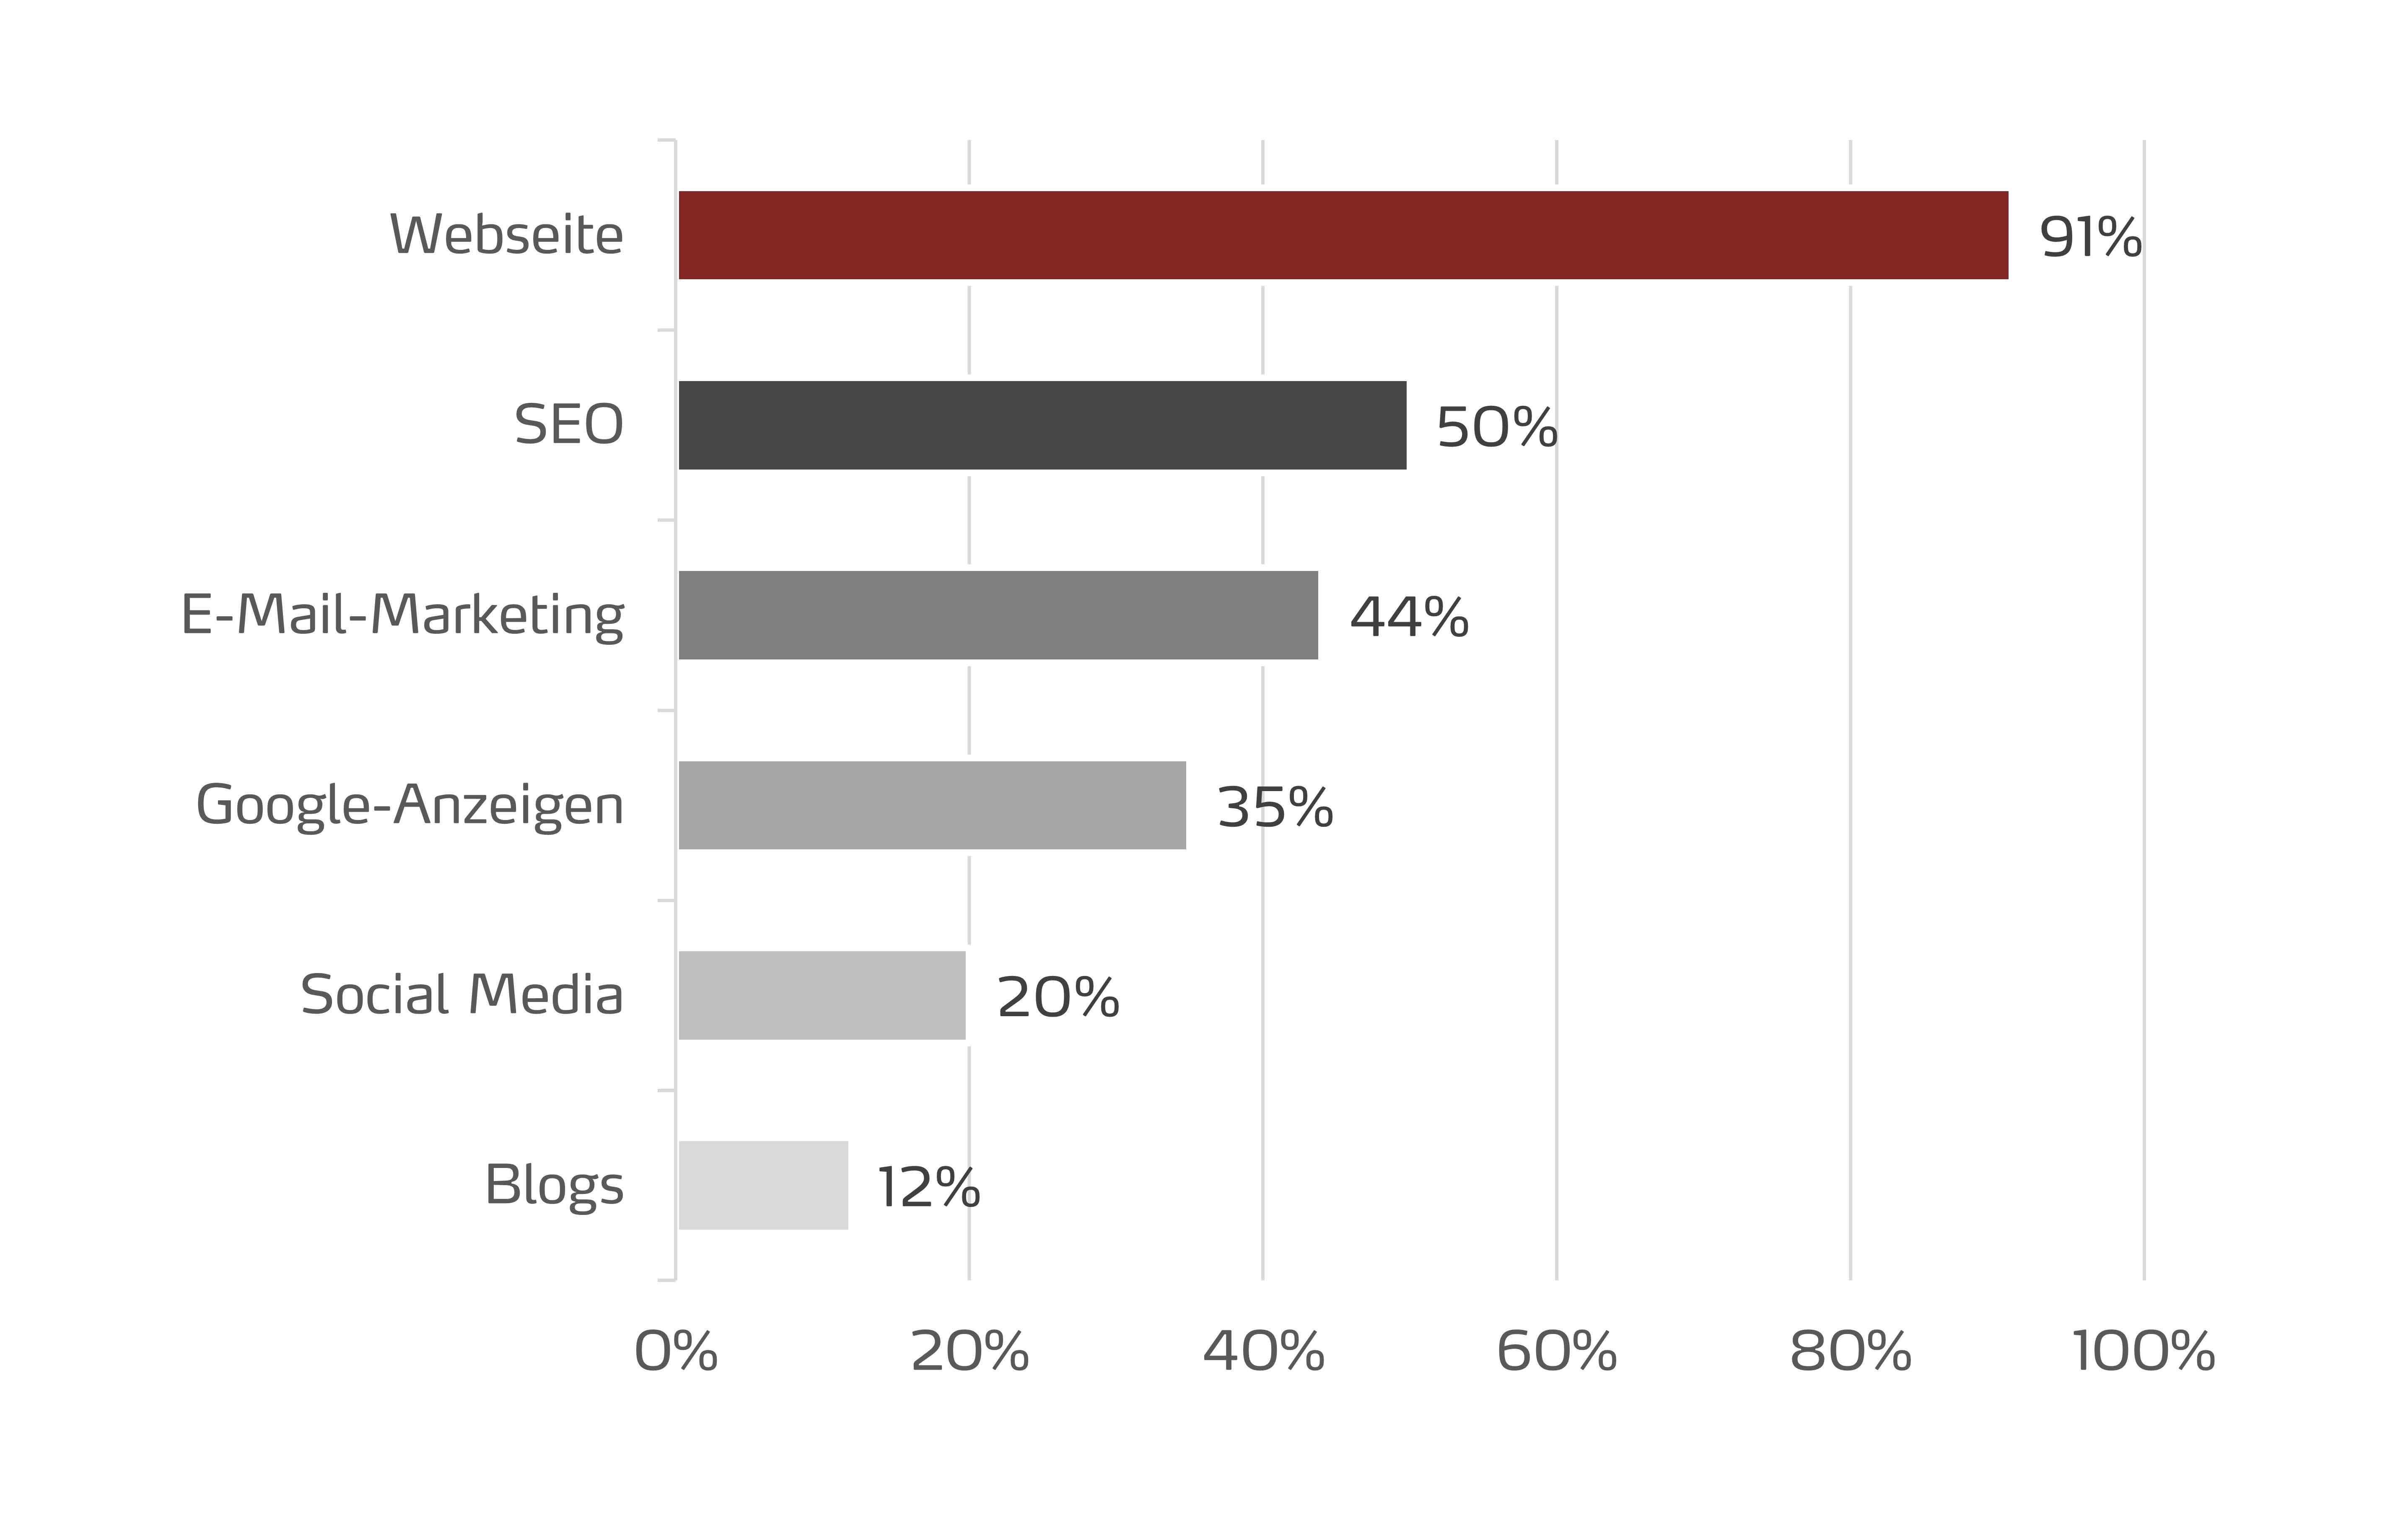 Top 5 Maßnahmen im Onlinemarketing 2016